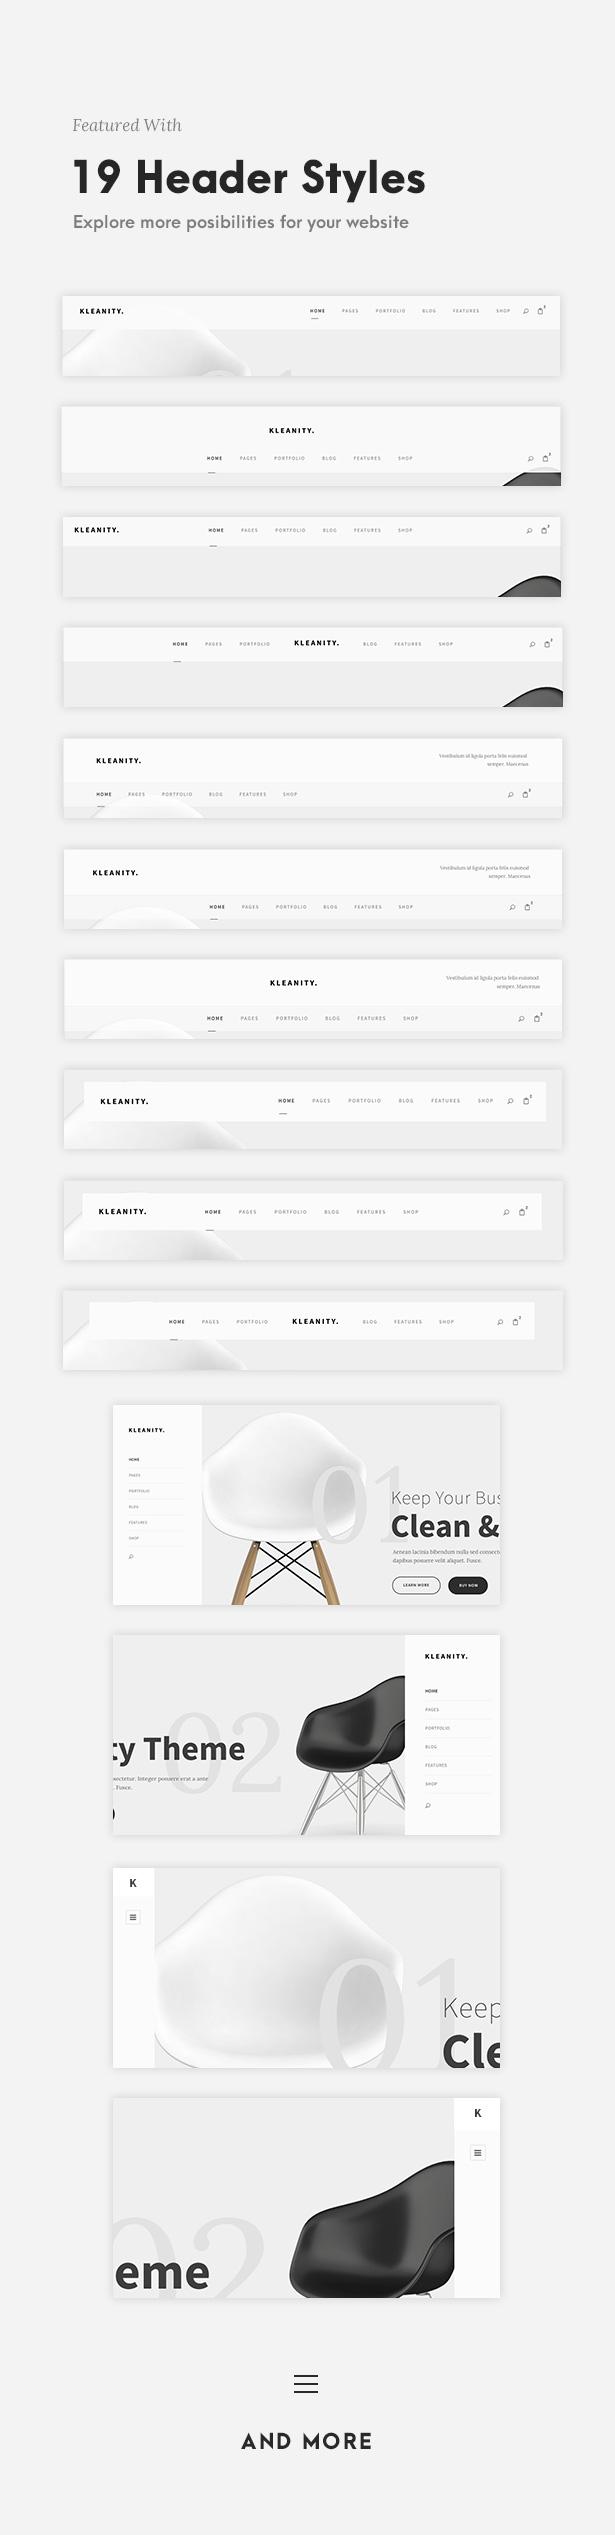 Kleanity - Minimalist WordPress Theme / Creative Portfolio - 5